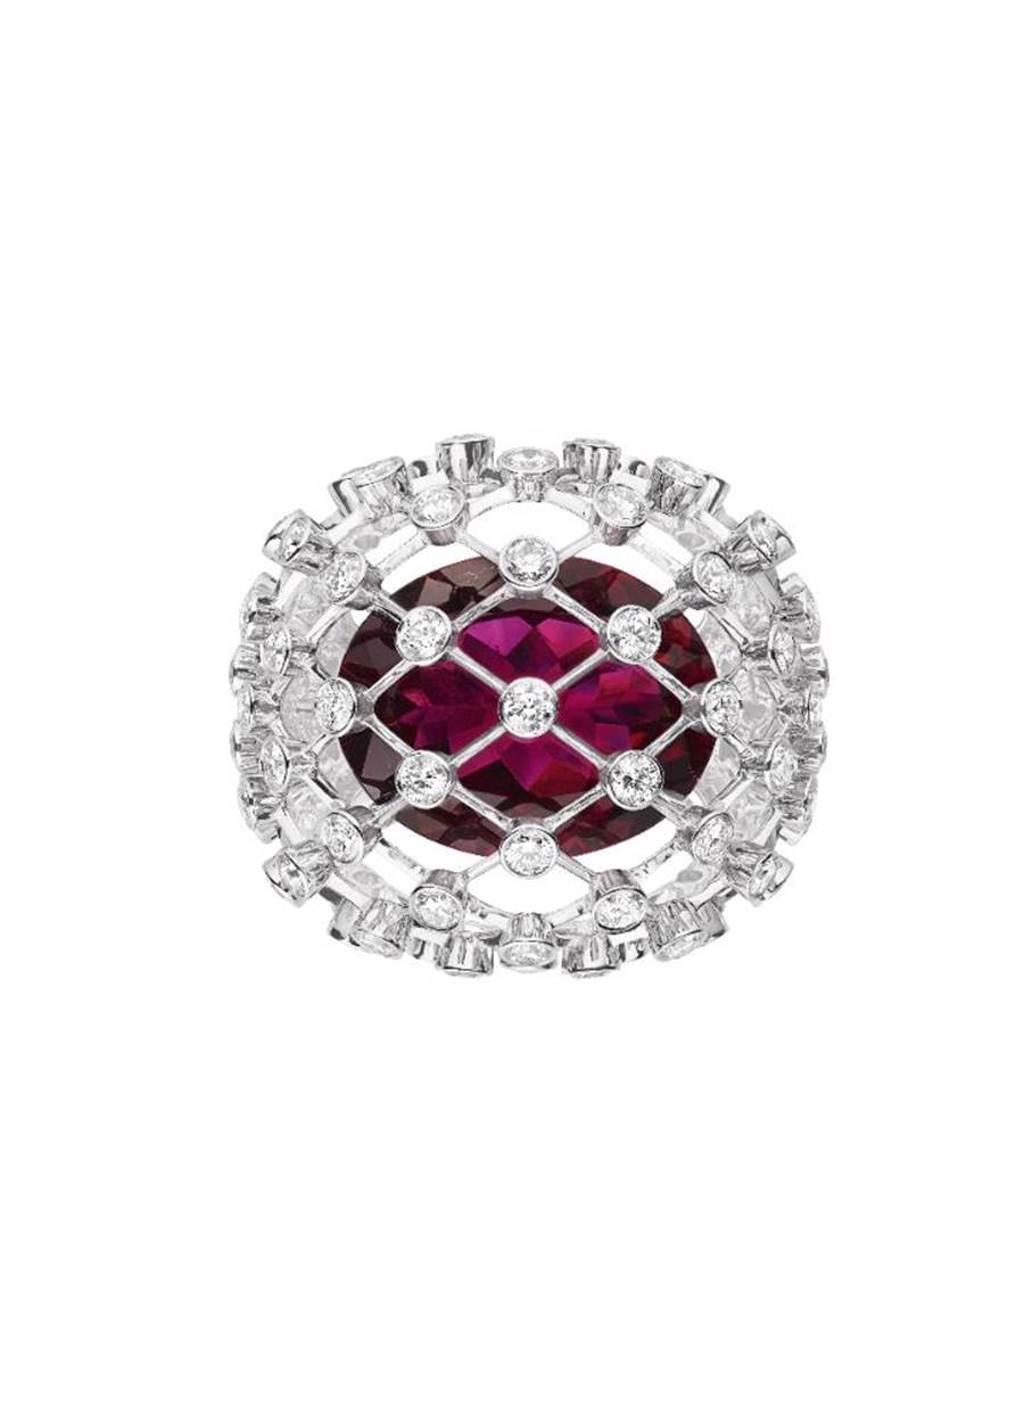 CHAUMET年度新品Lacis戒指融入「刀鋒工藝」(fil couteau),紅碧璽猶如懸浮在鑽網之中,約650萬元。(CHAUMET提供)